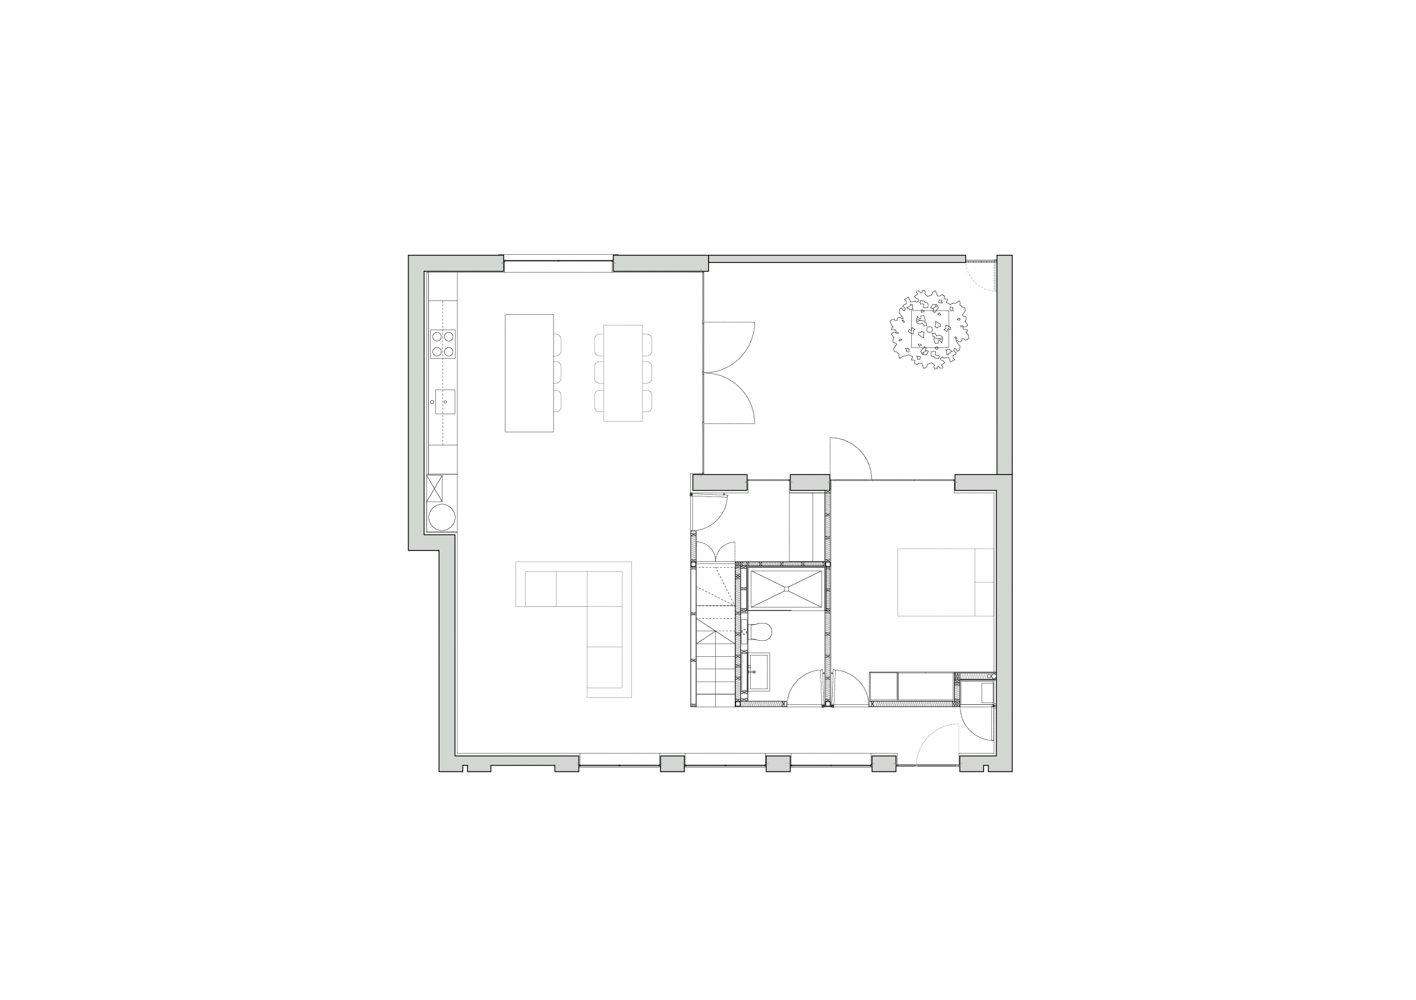 defoe-road-paper-house-project-the-design-emotive-18.jpg